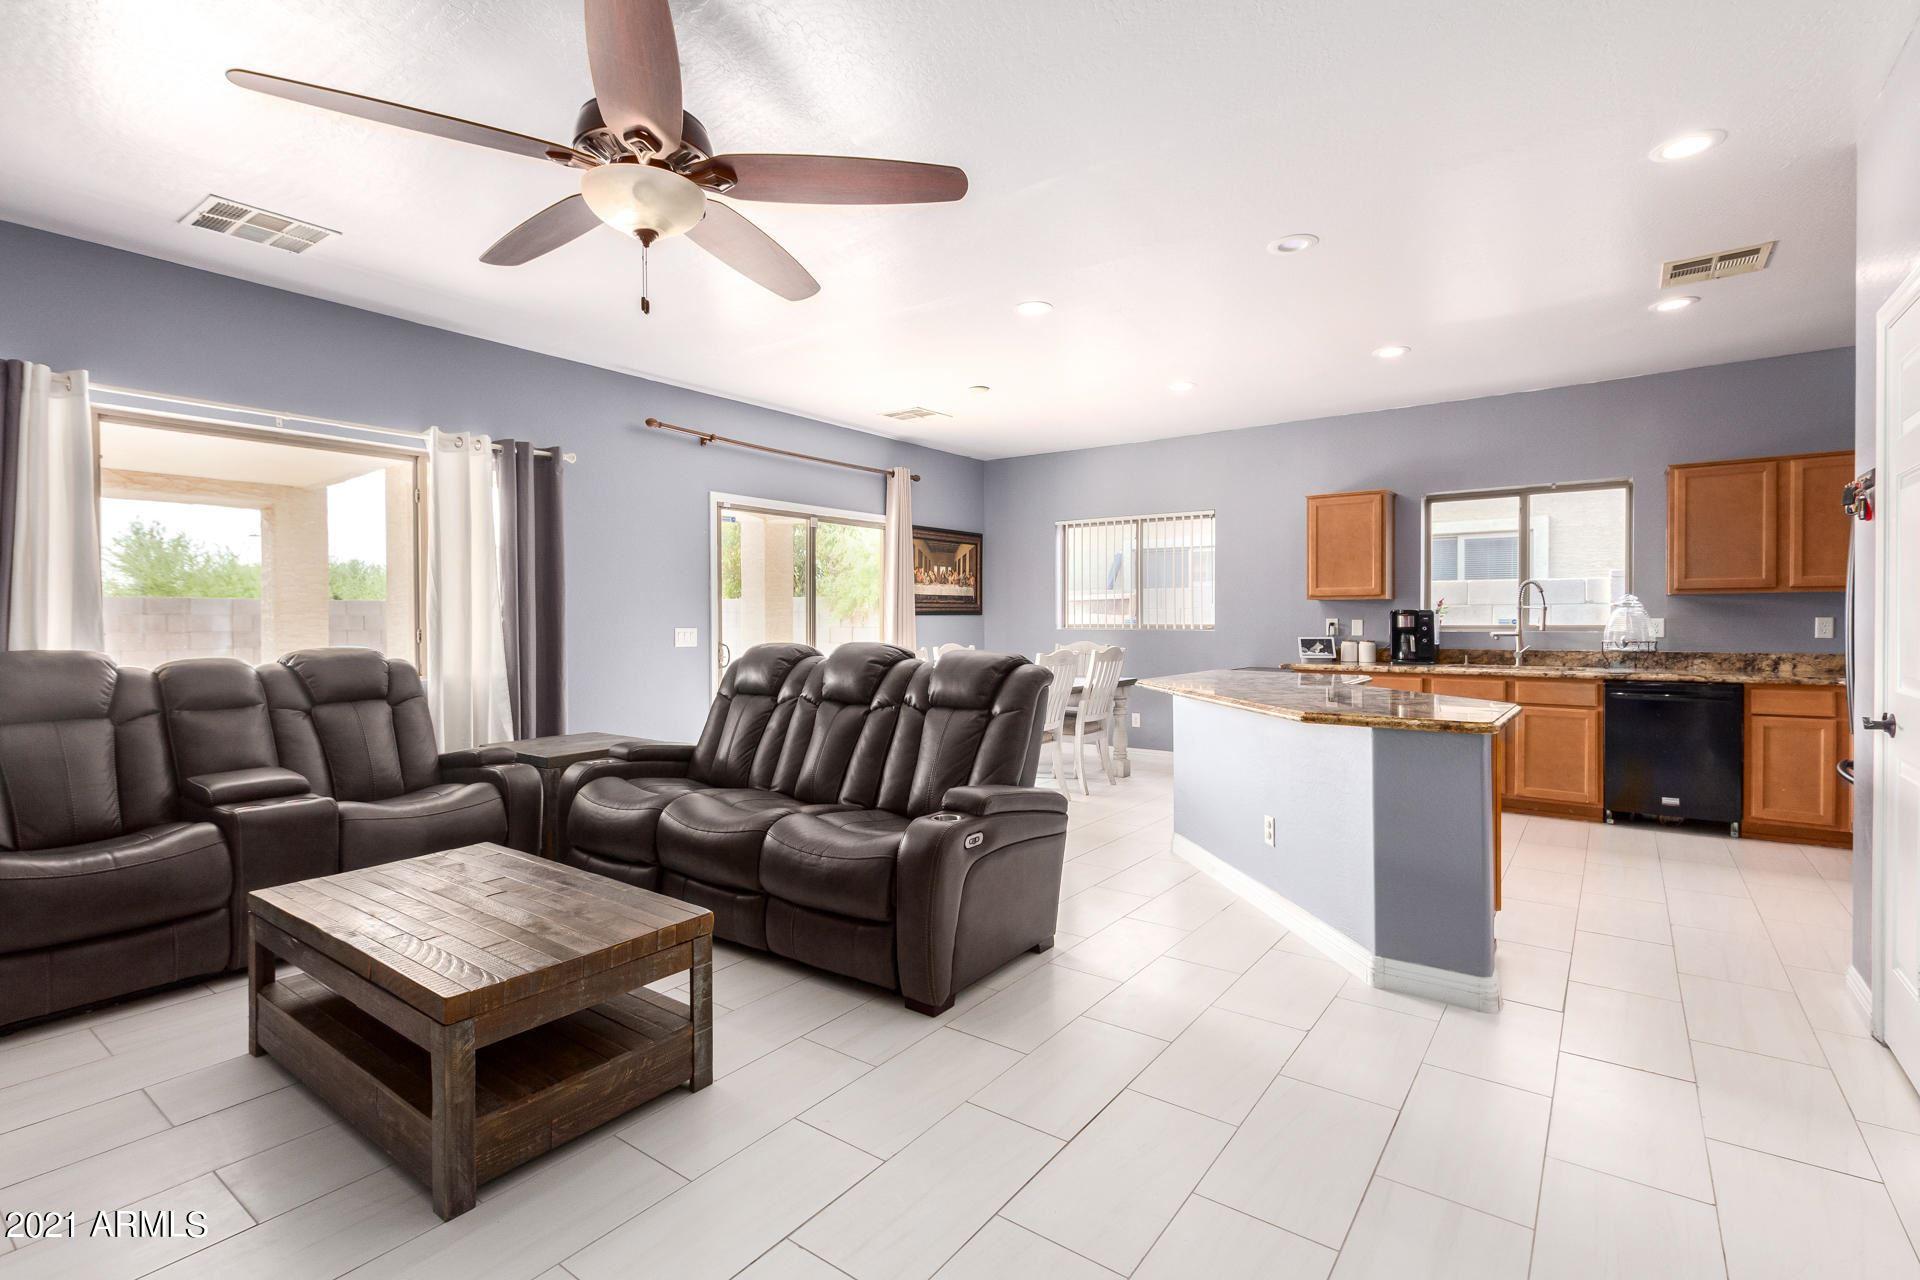 Photo of 3712 S 92ND Lane, Tolleson, AZ 85353 (MLS # 6265095)